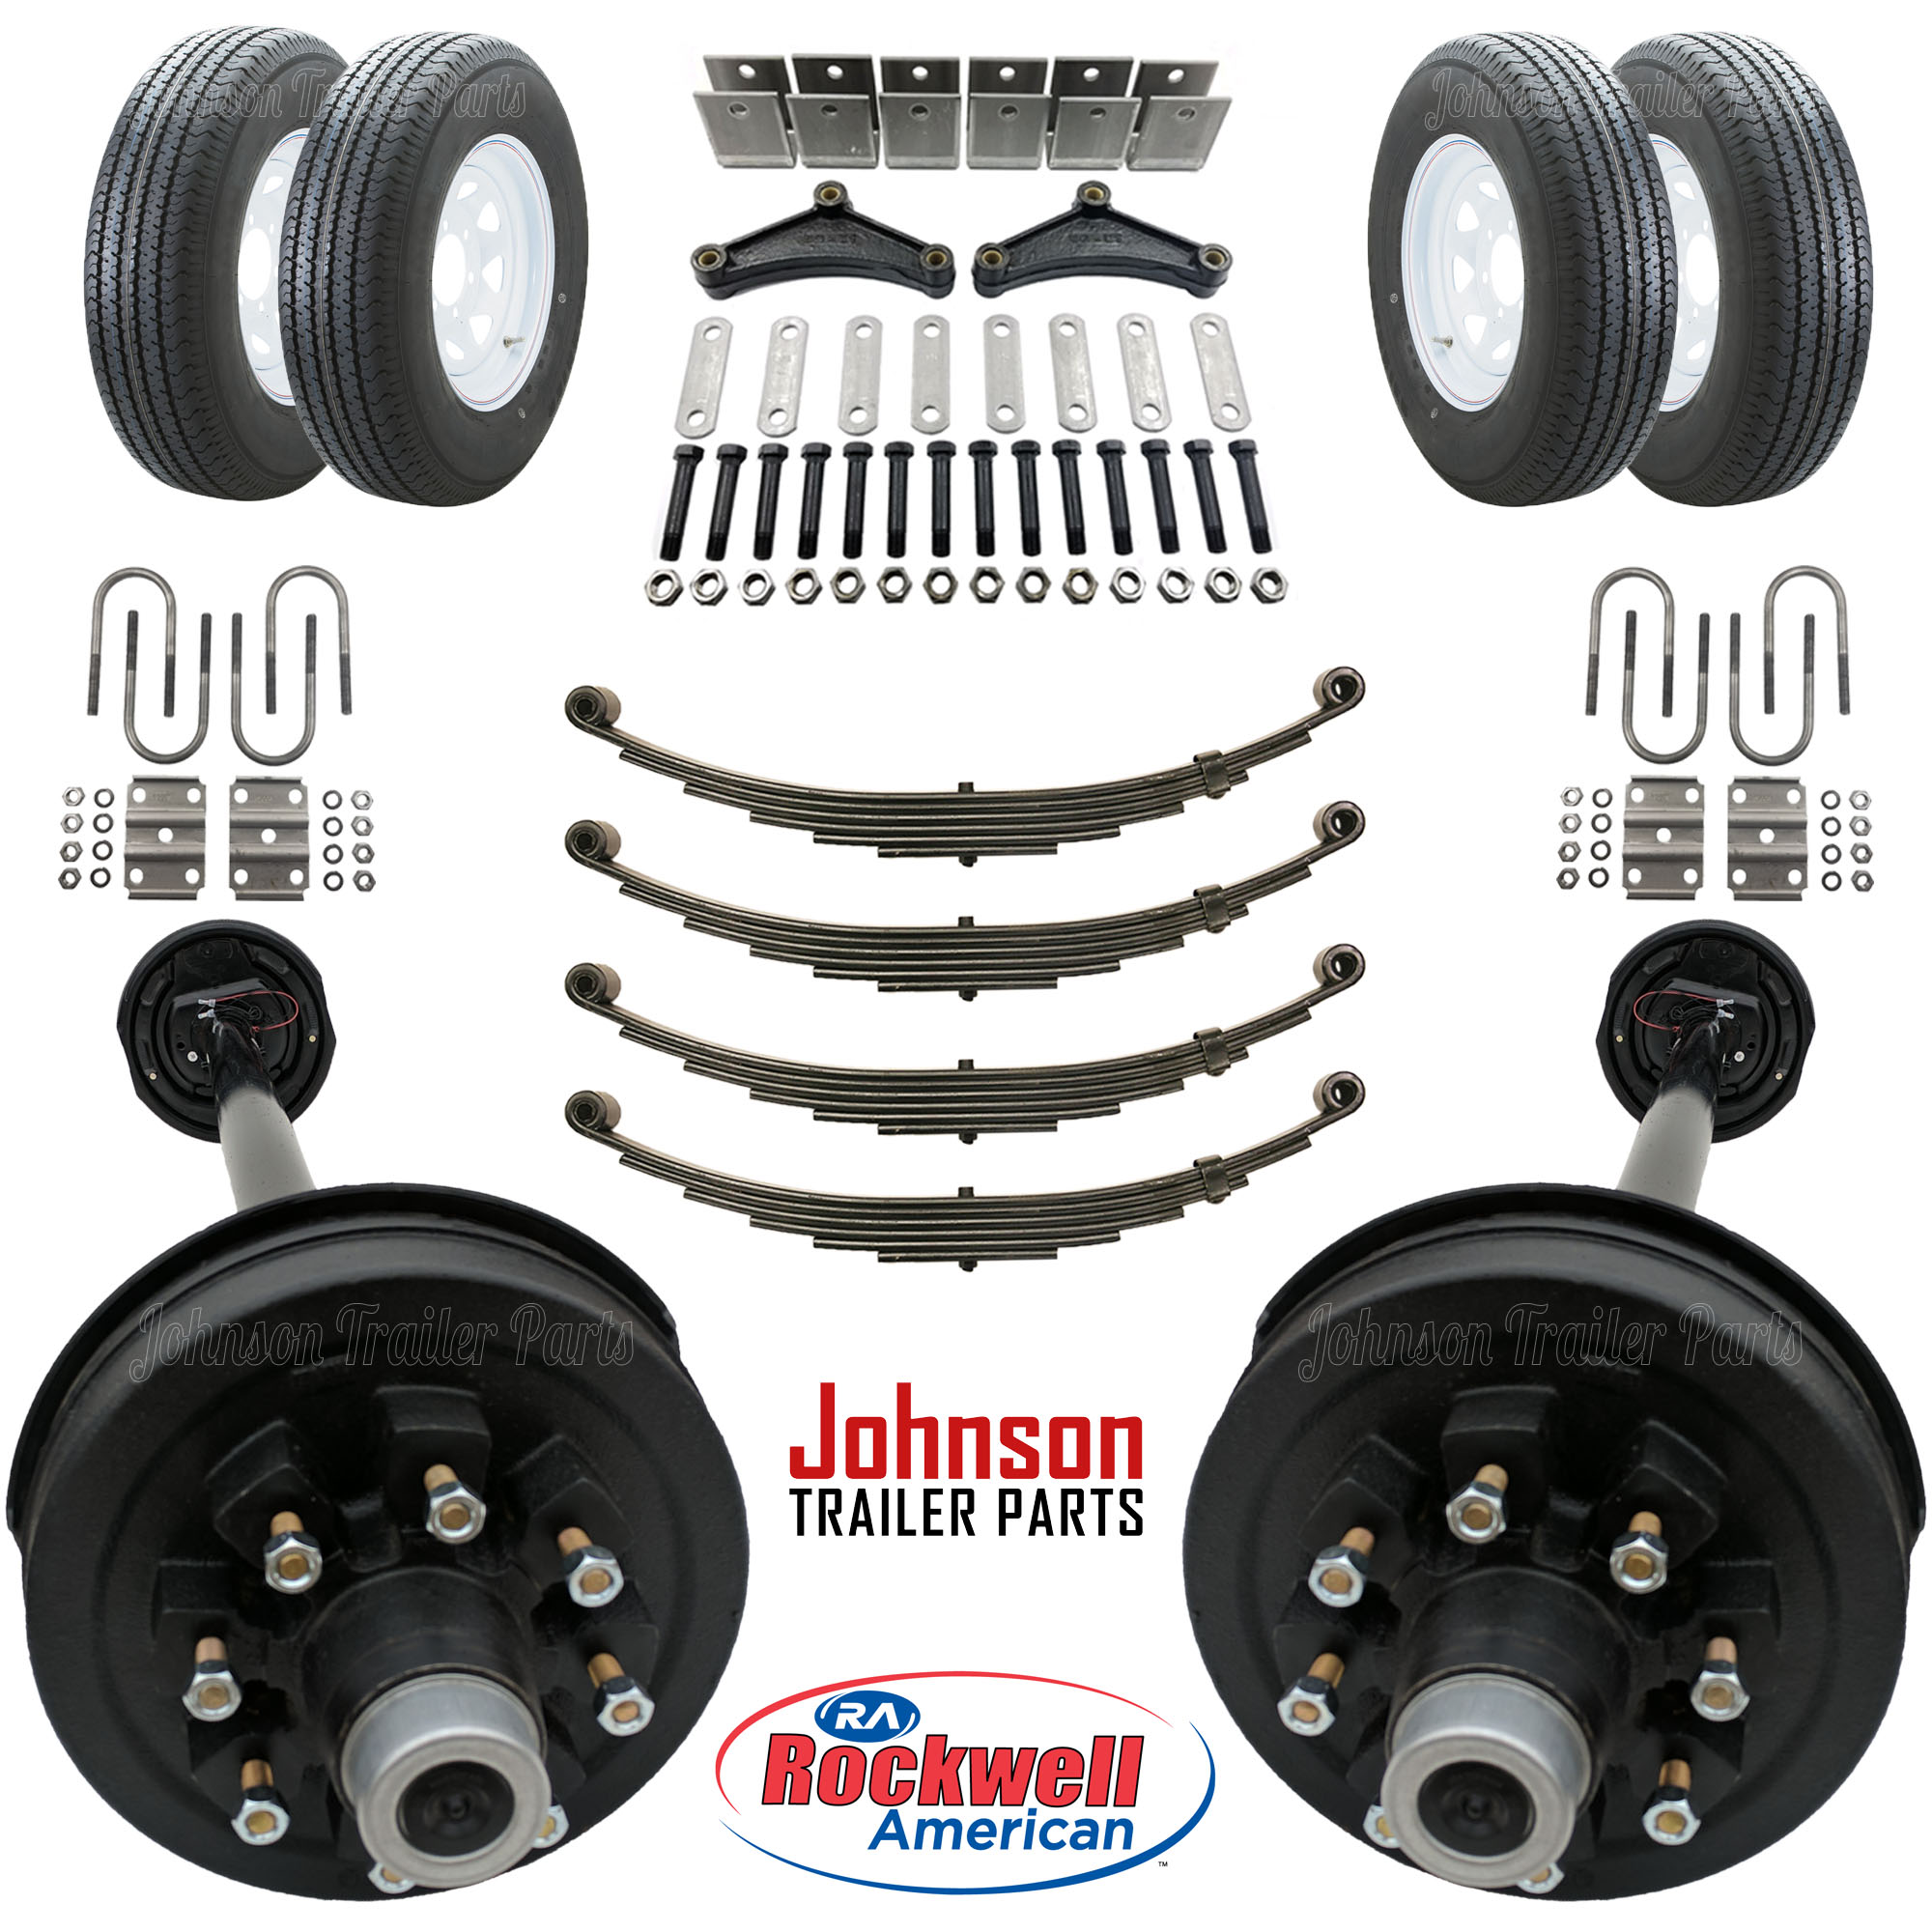 Wheel Axle Kits : Tandem lb electric brake trailer axle kit w wheels